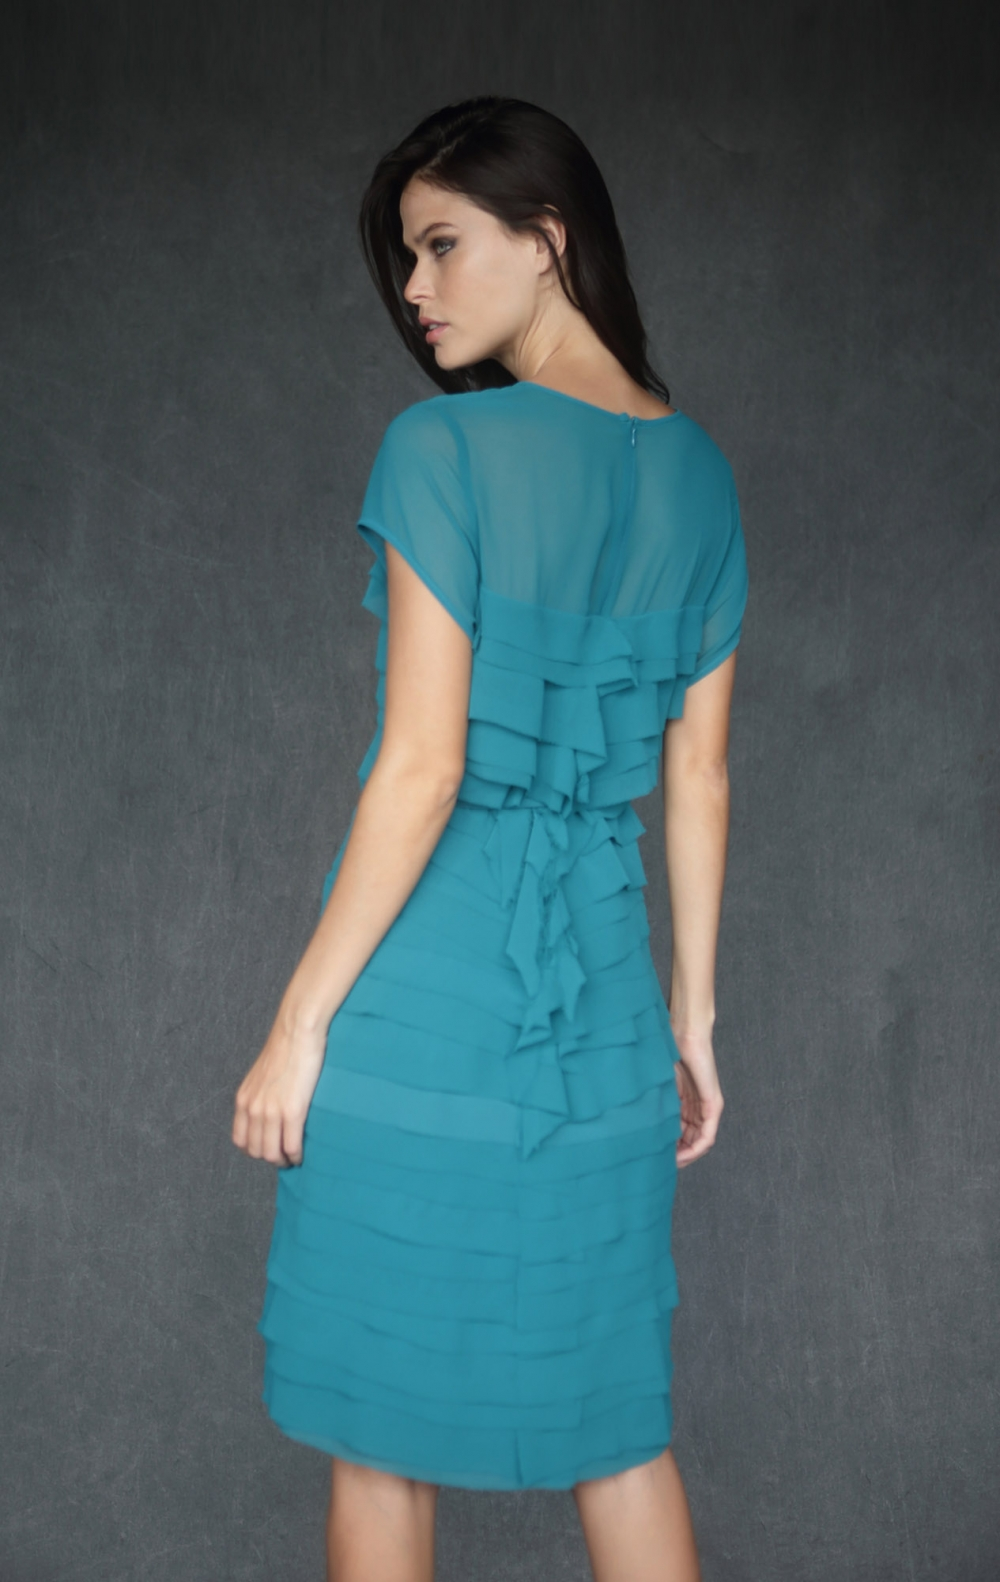 Vestido Donna Turkey - Foto 2